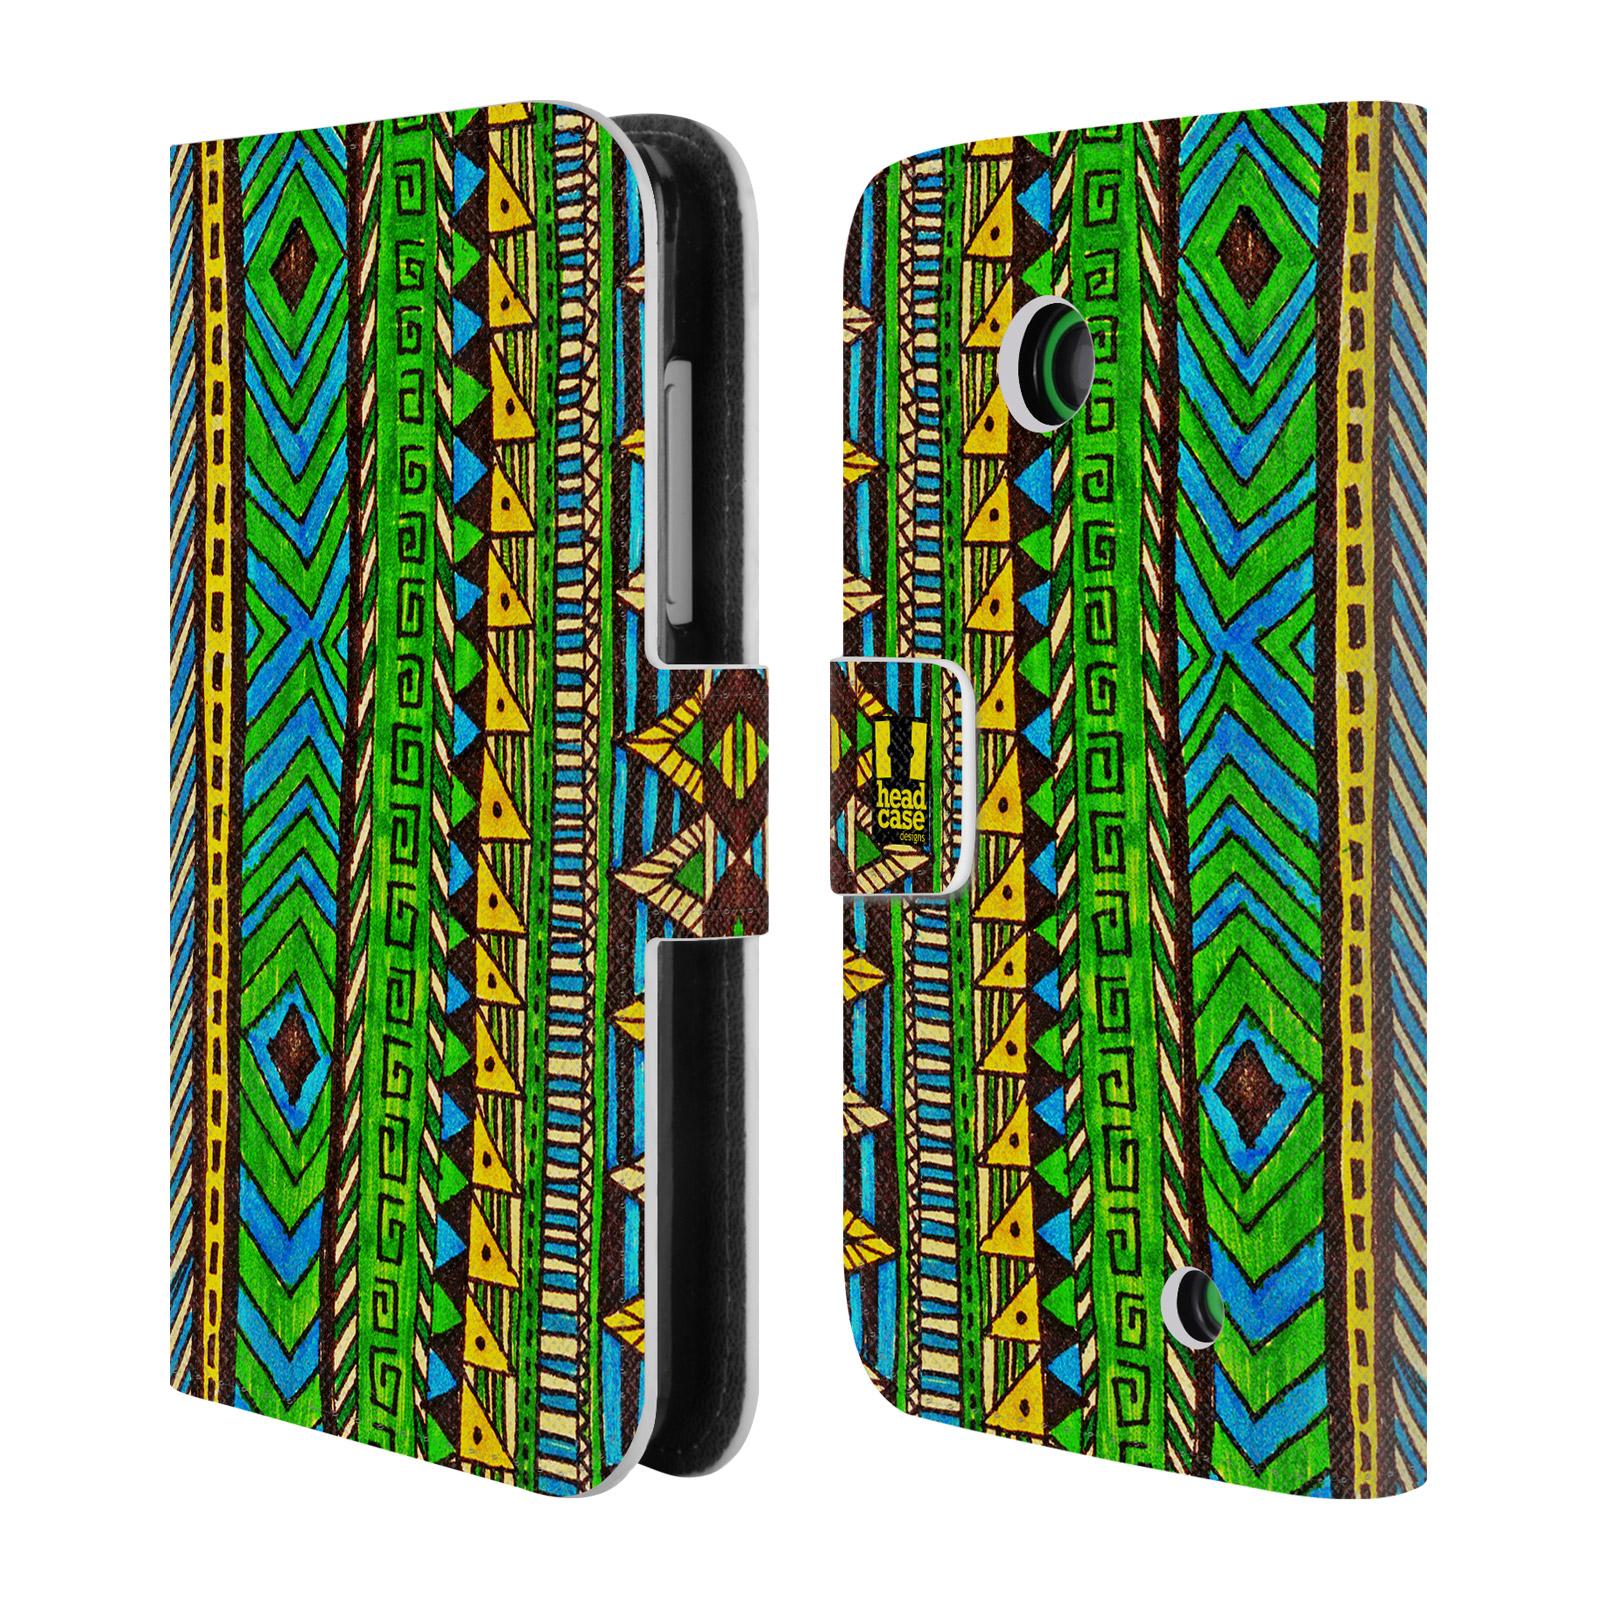 HEAD CASE Flipové pouzdro pro mobil NOKIA LUMIA 630 / LUMIA 630 DUAL Barevná aztécká čmáranice zelená